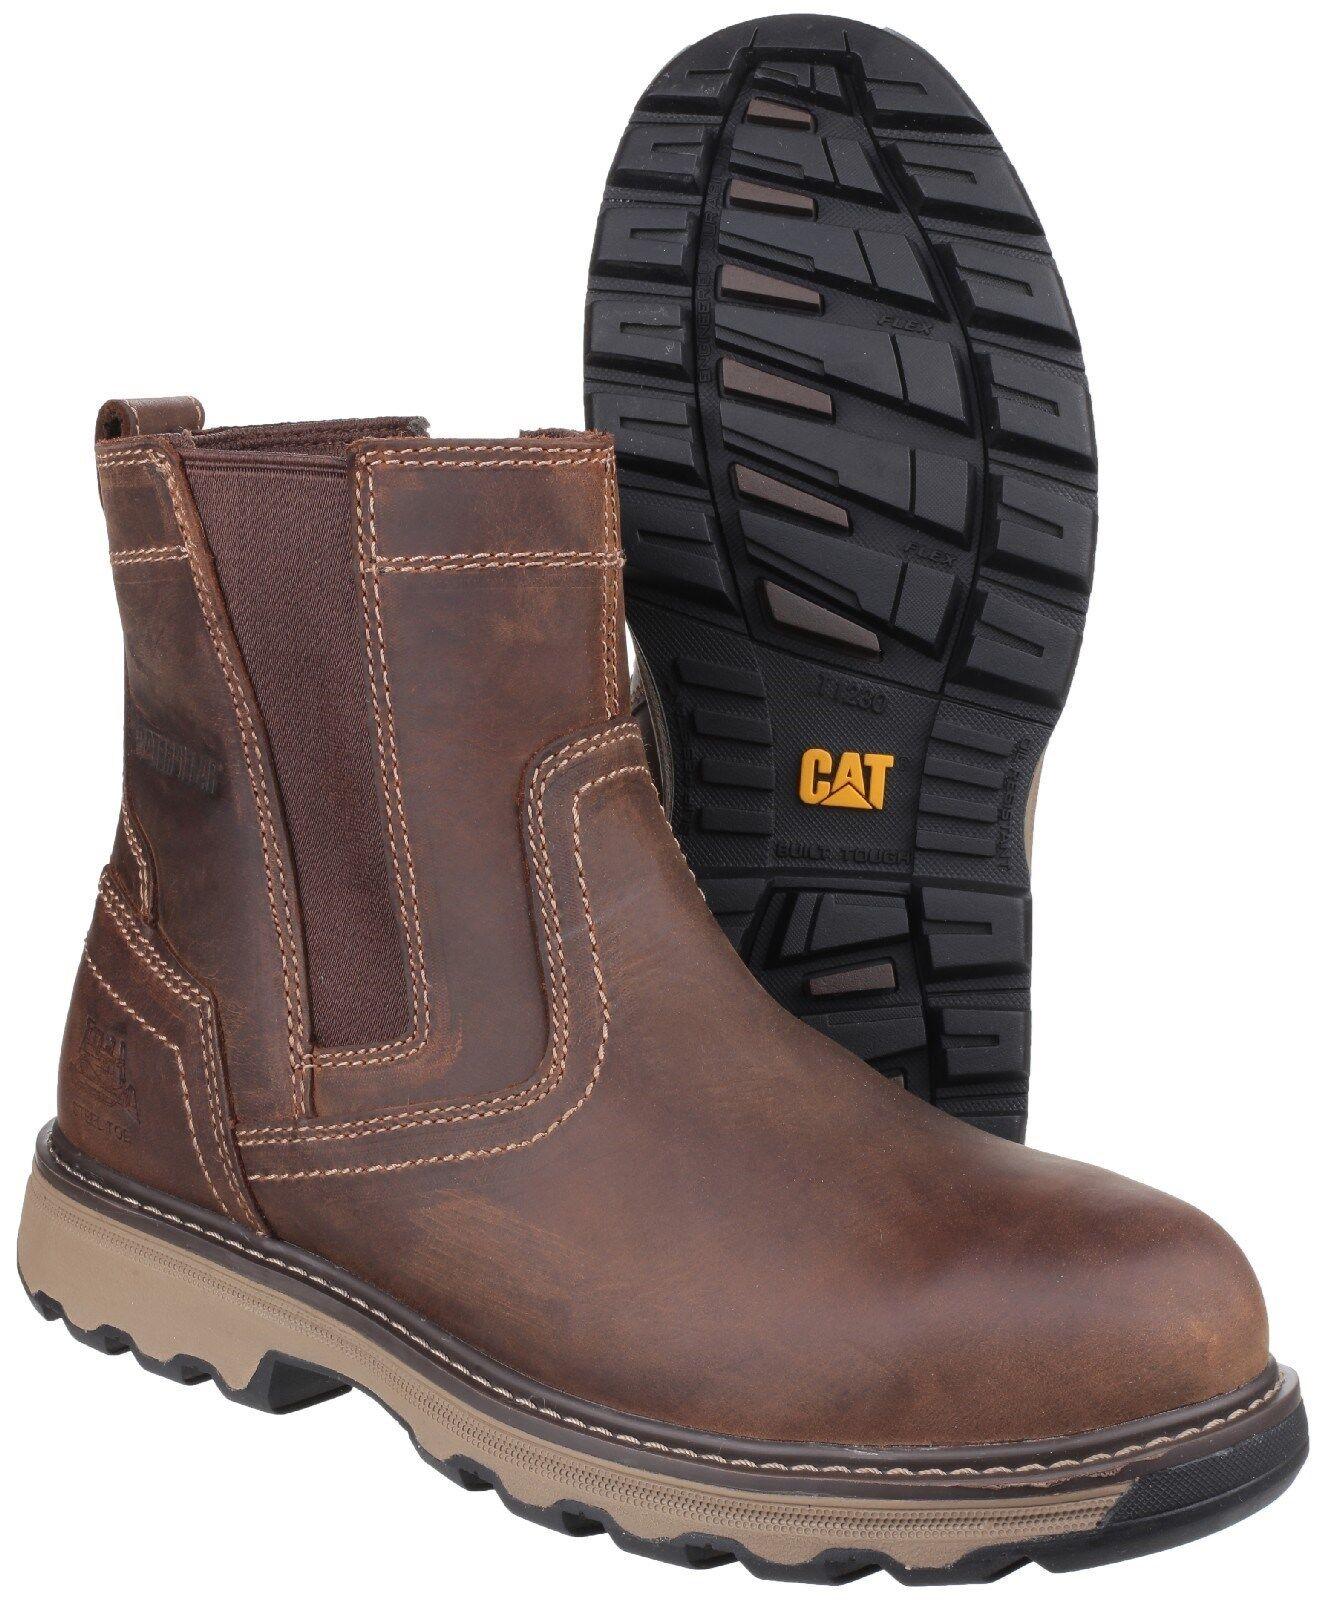 CAT Caterpillar Pelton Safety Dealer Boots Industrial Shoes Mens Work Shoes Industrial UK6-12 1609c5